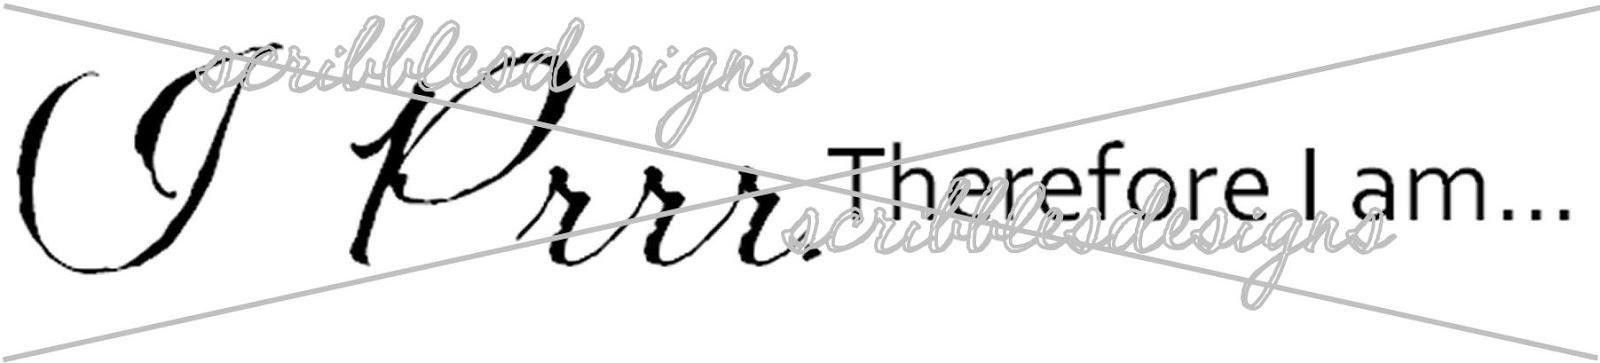 http://buyscribblesdesigns.blogspot.ca/2015/02/0110-i-prrr-100.html